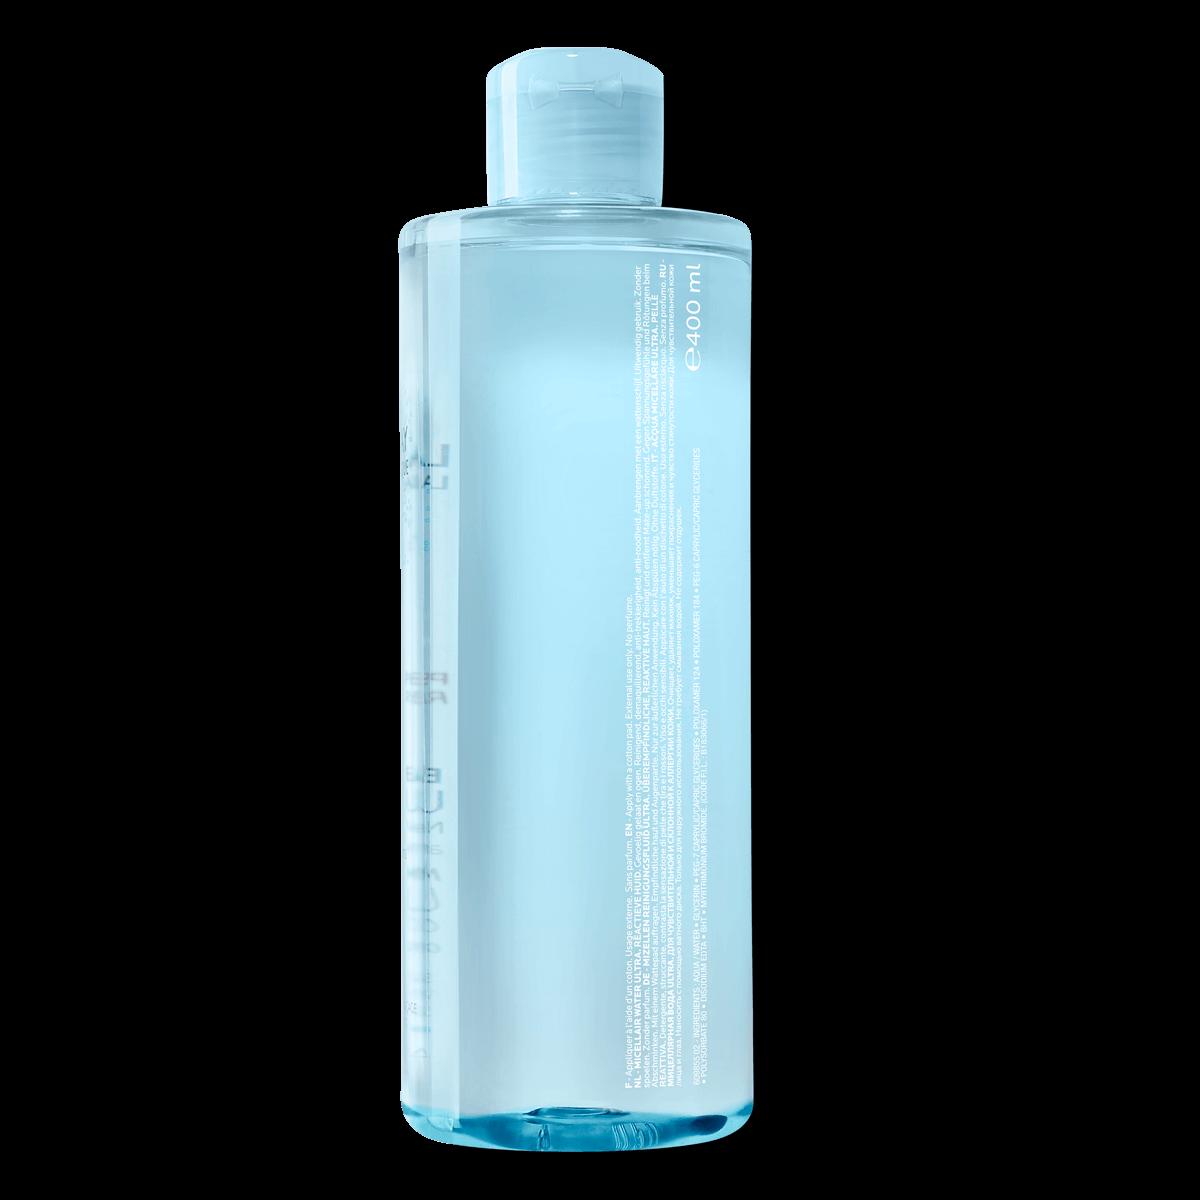 La Roche Posay ProduktSide Ansigtsrens Fysiologisk micellarvand